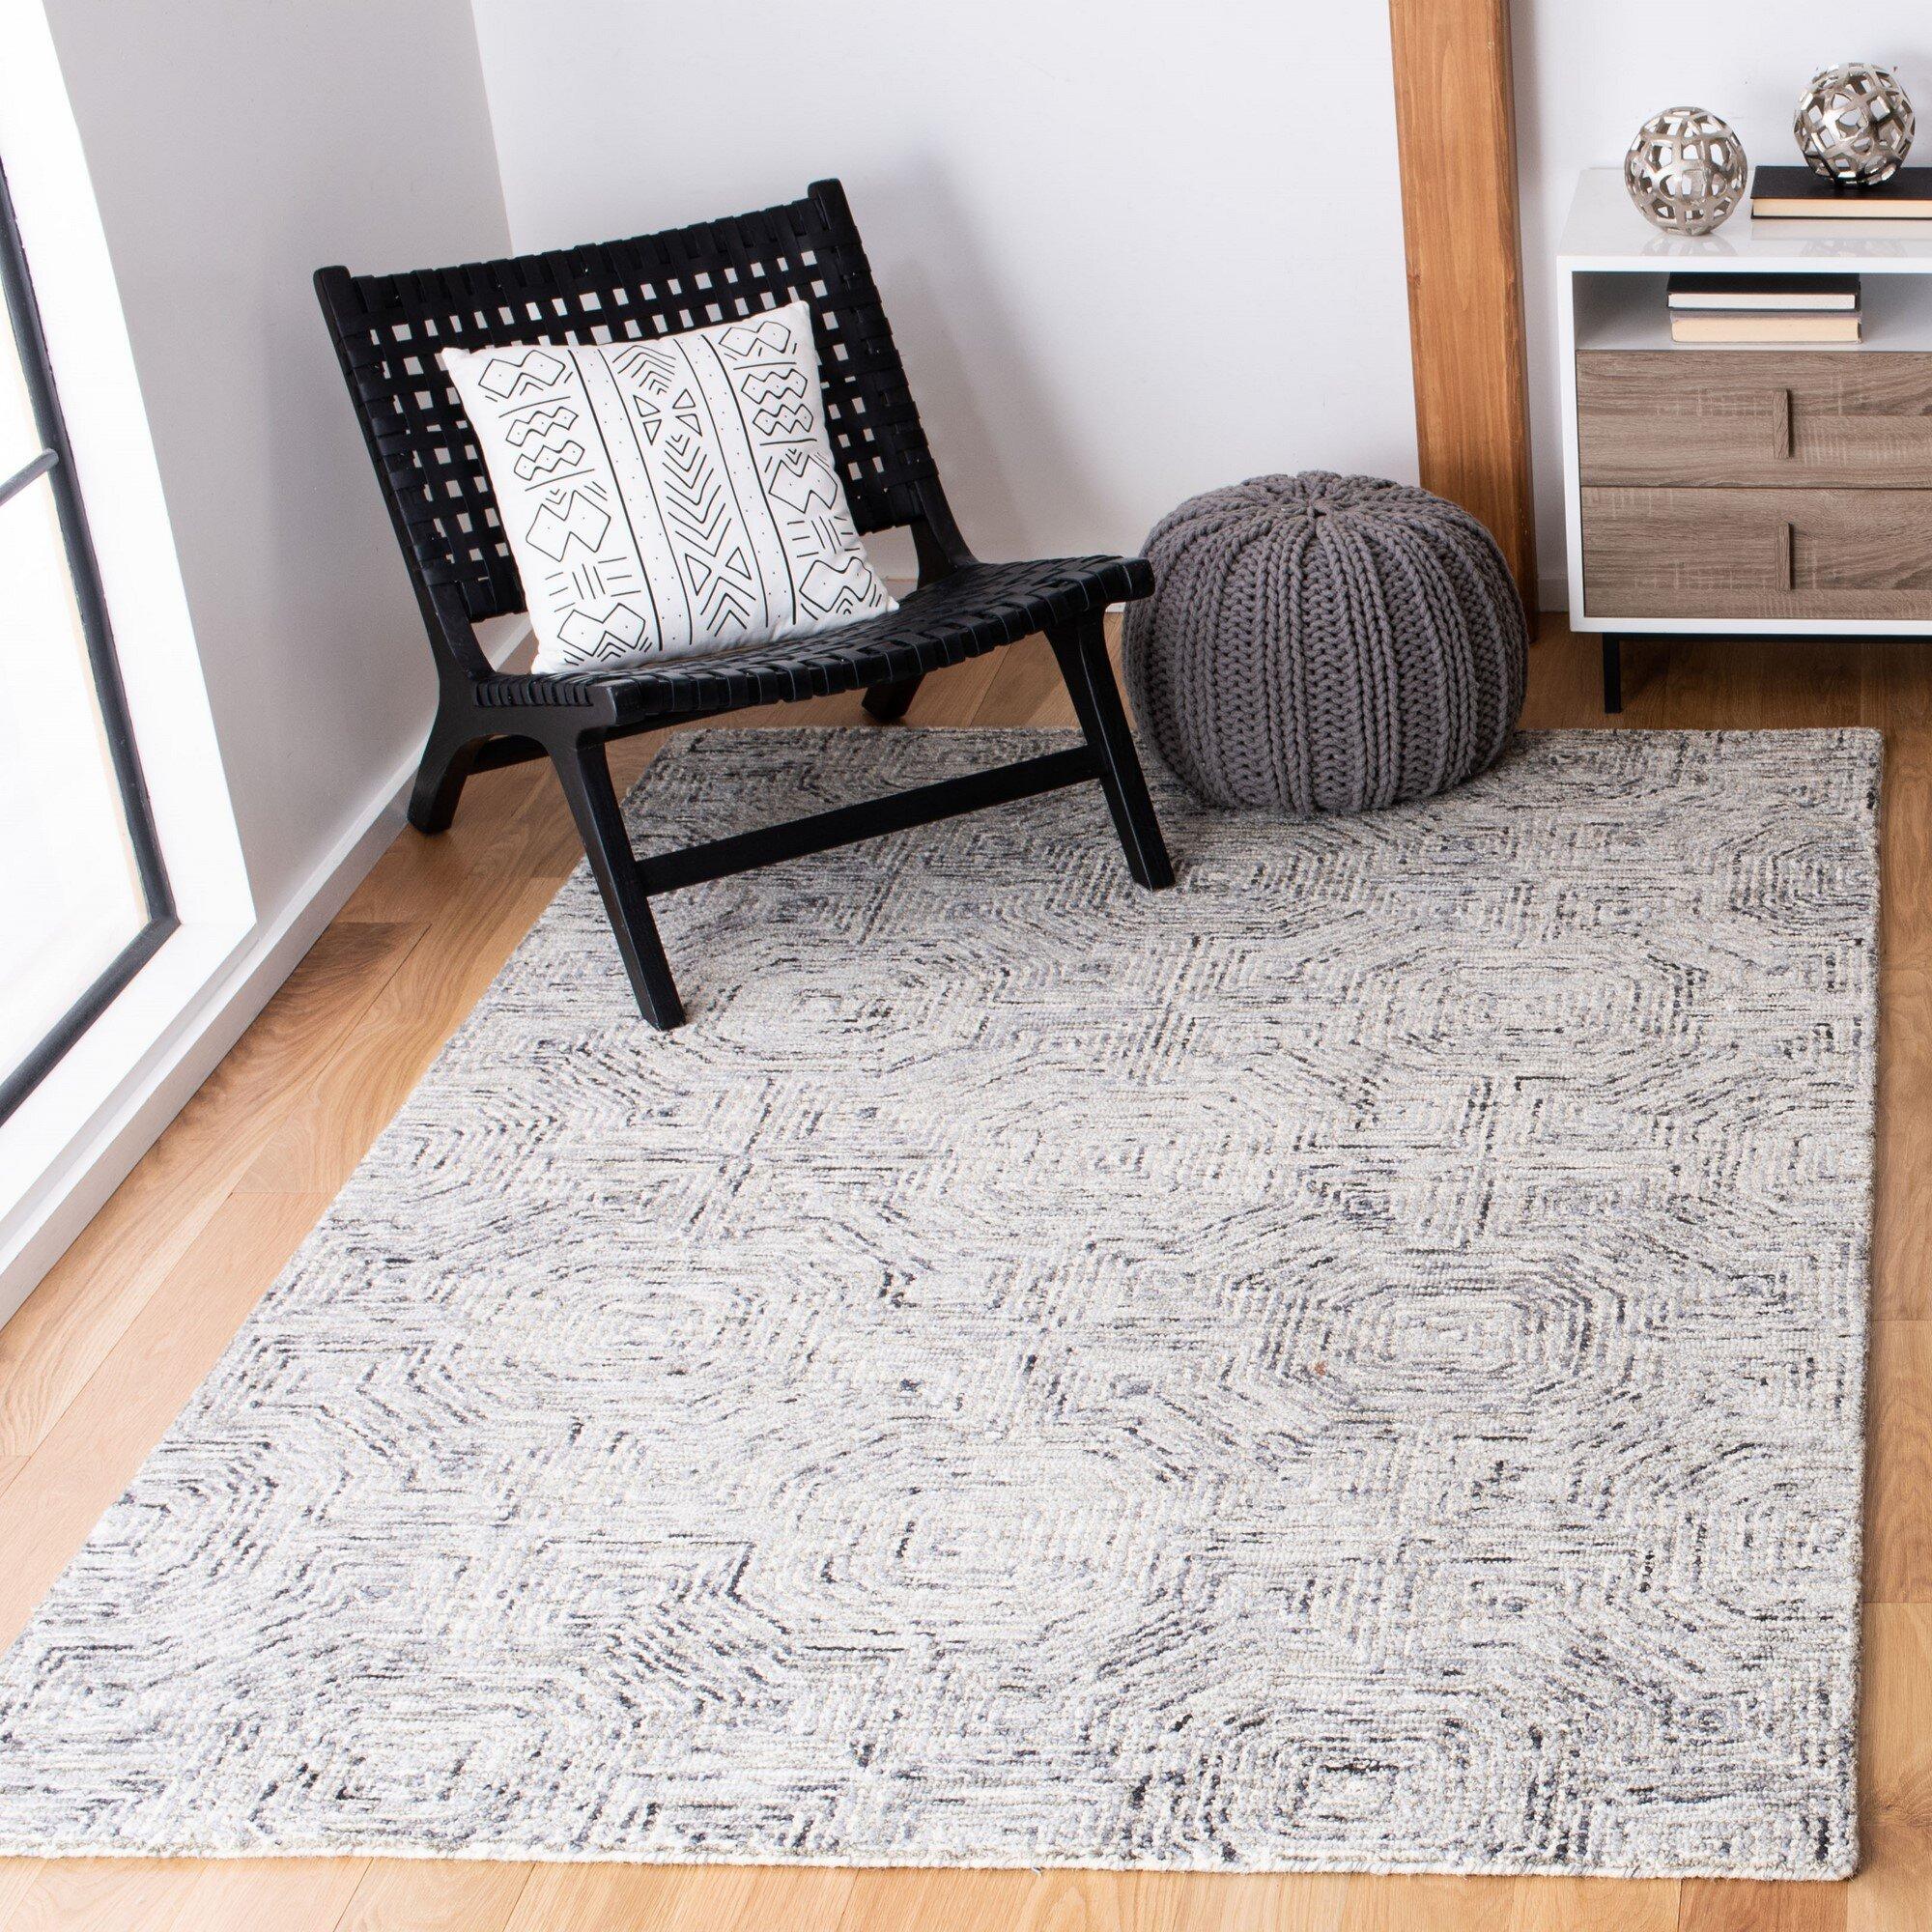 Union Rustic Deyoung Geometric Handmade Tufted Wool Gray Area Rug Wayfair